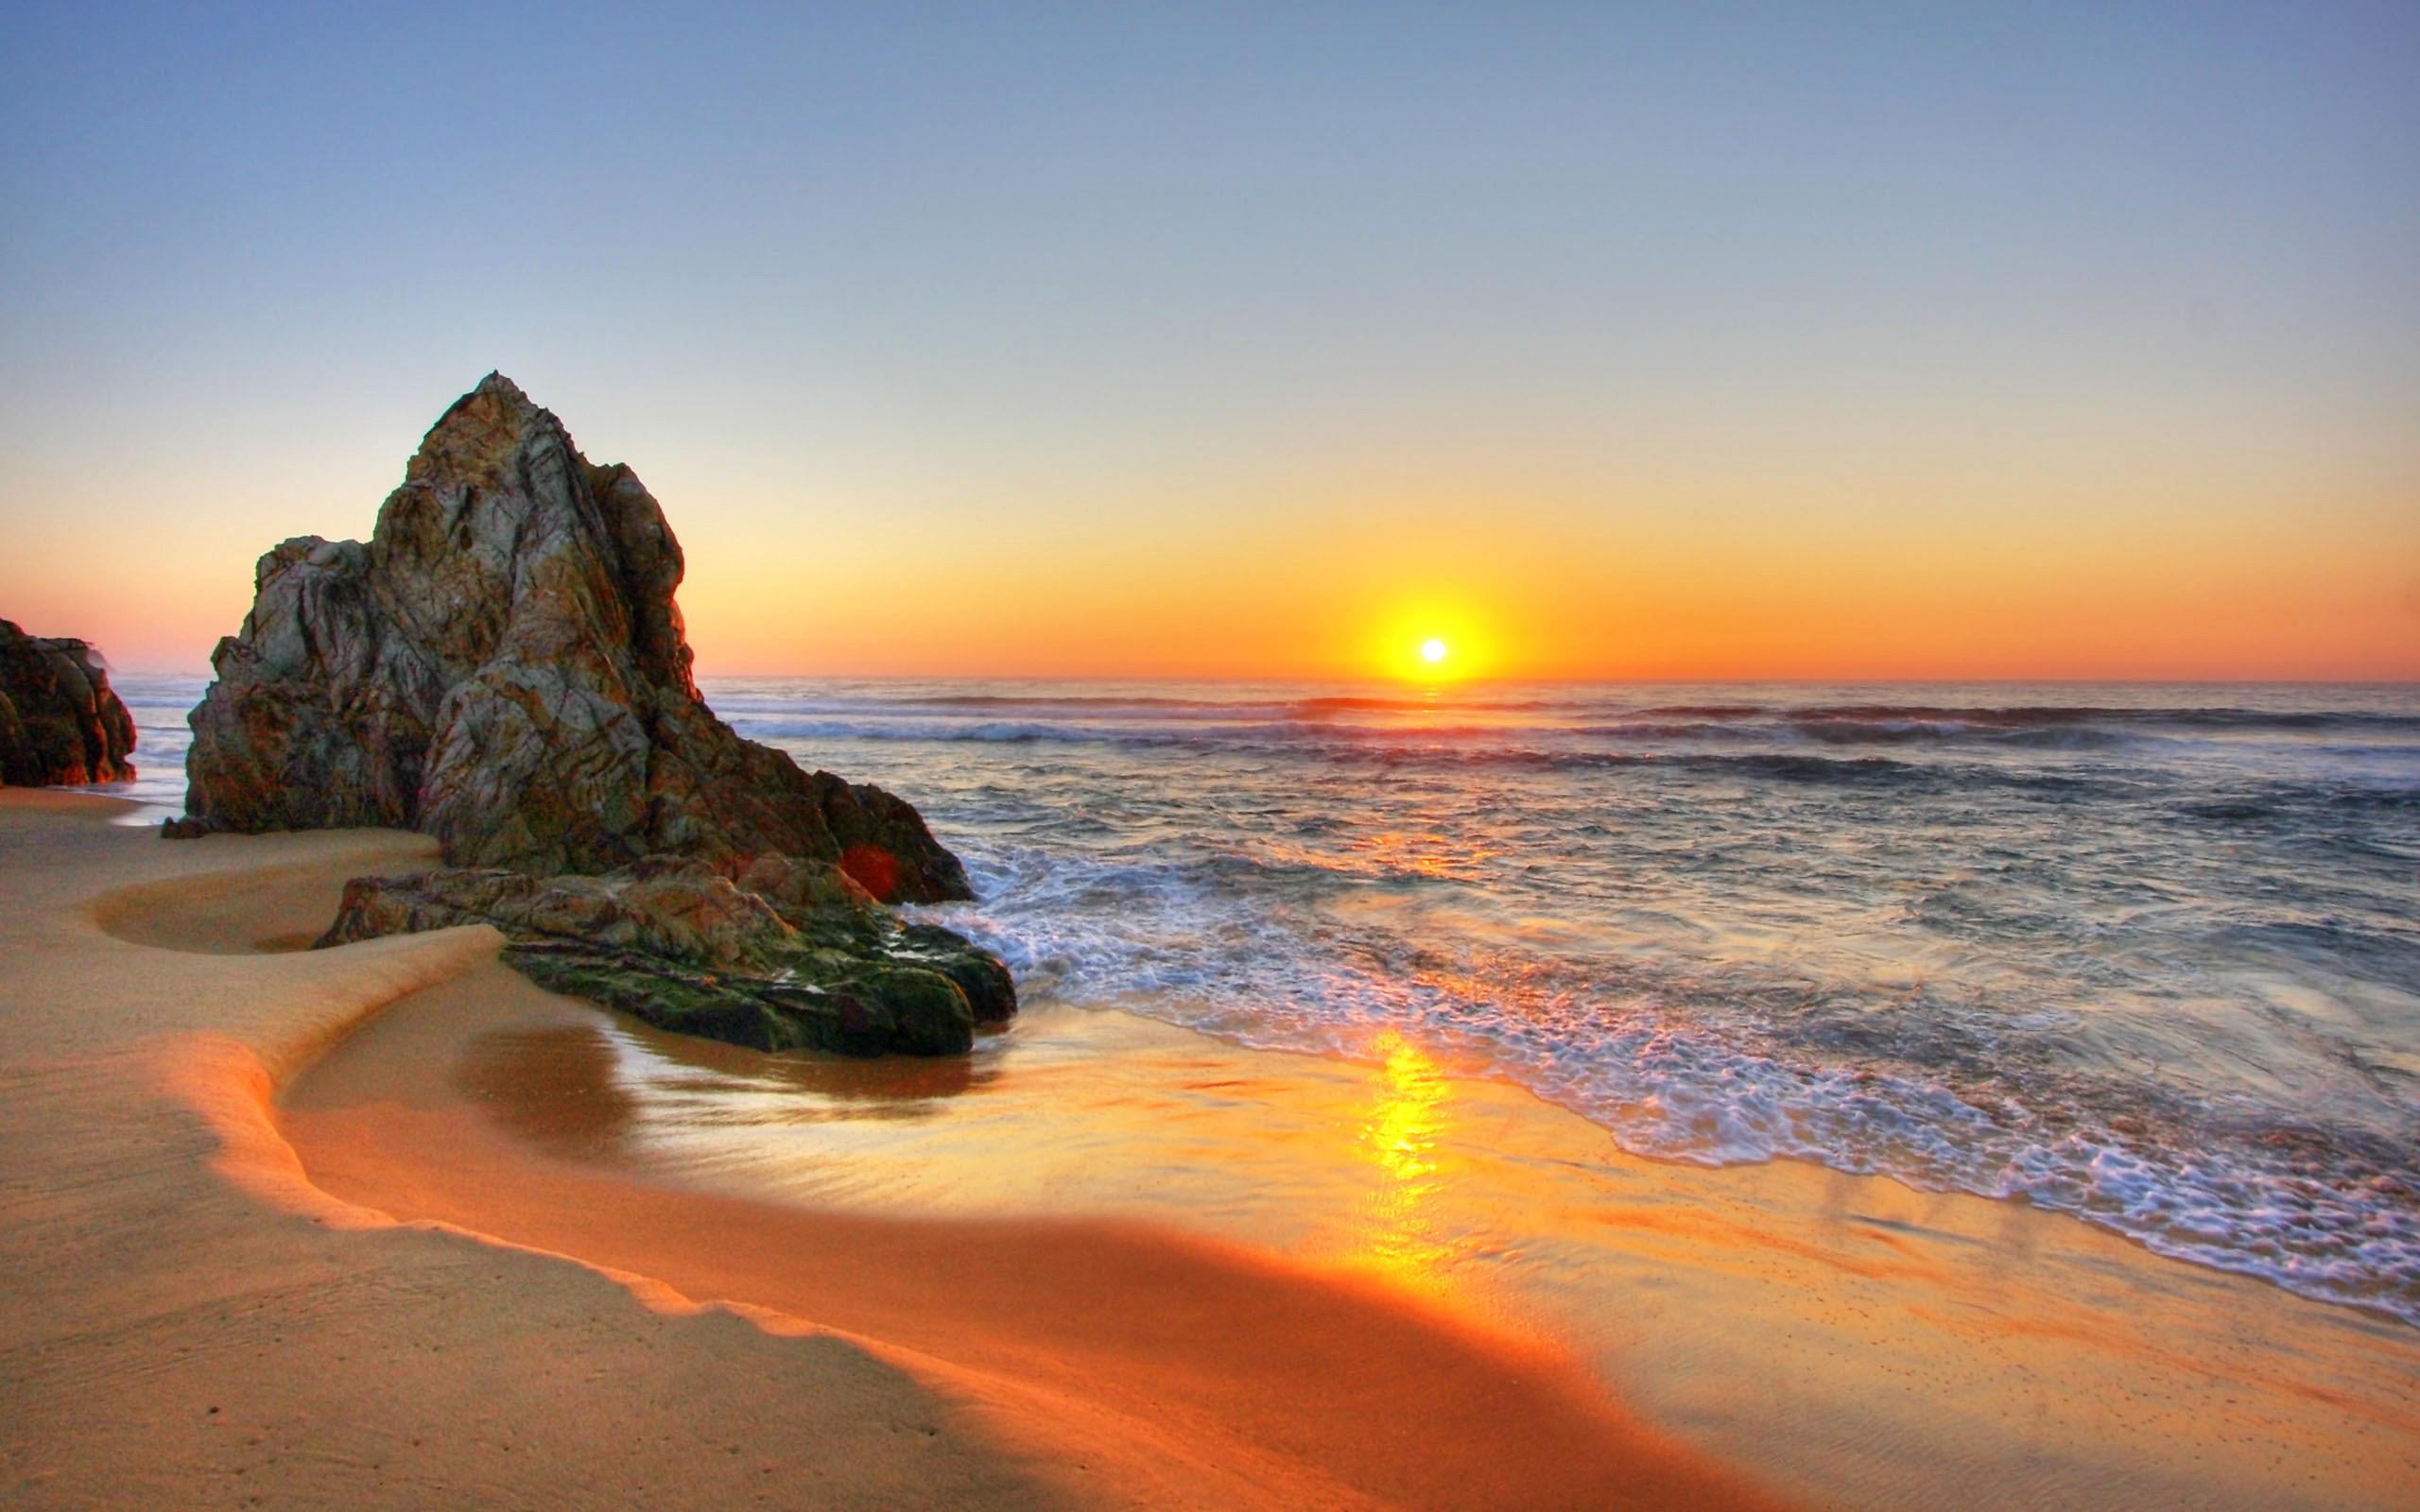 … The inspiring view of sunrise on Tathra Beach, Australia